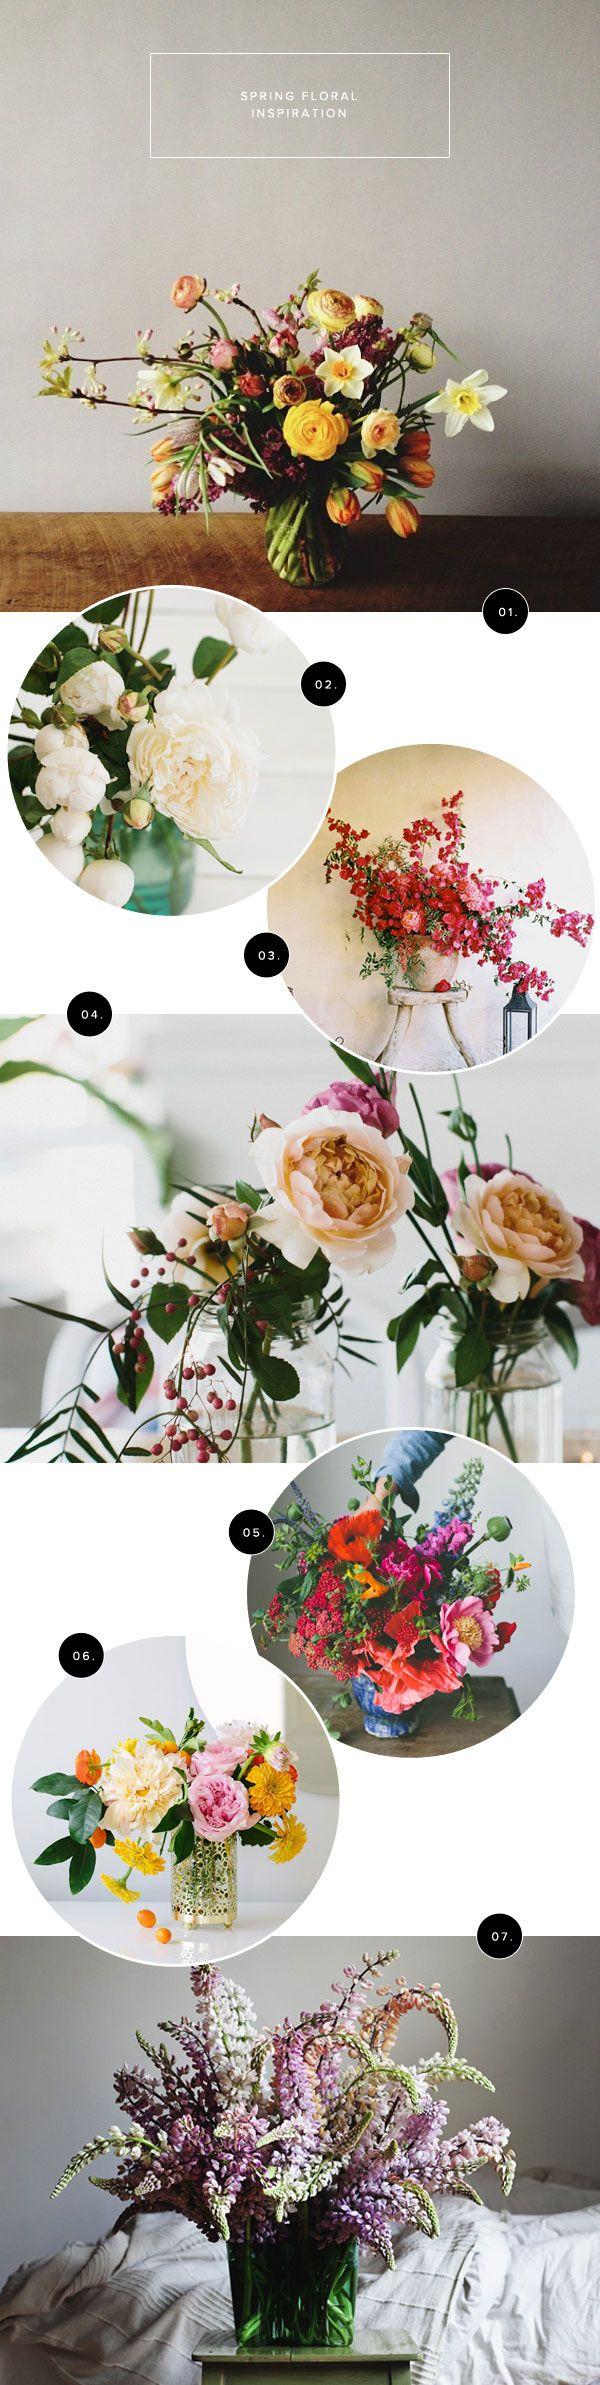 Zuma beach wedding venues   best wedding images on Pinterest  Weddings The bride and